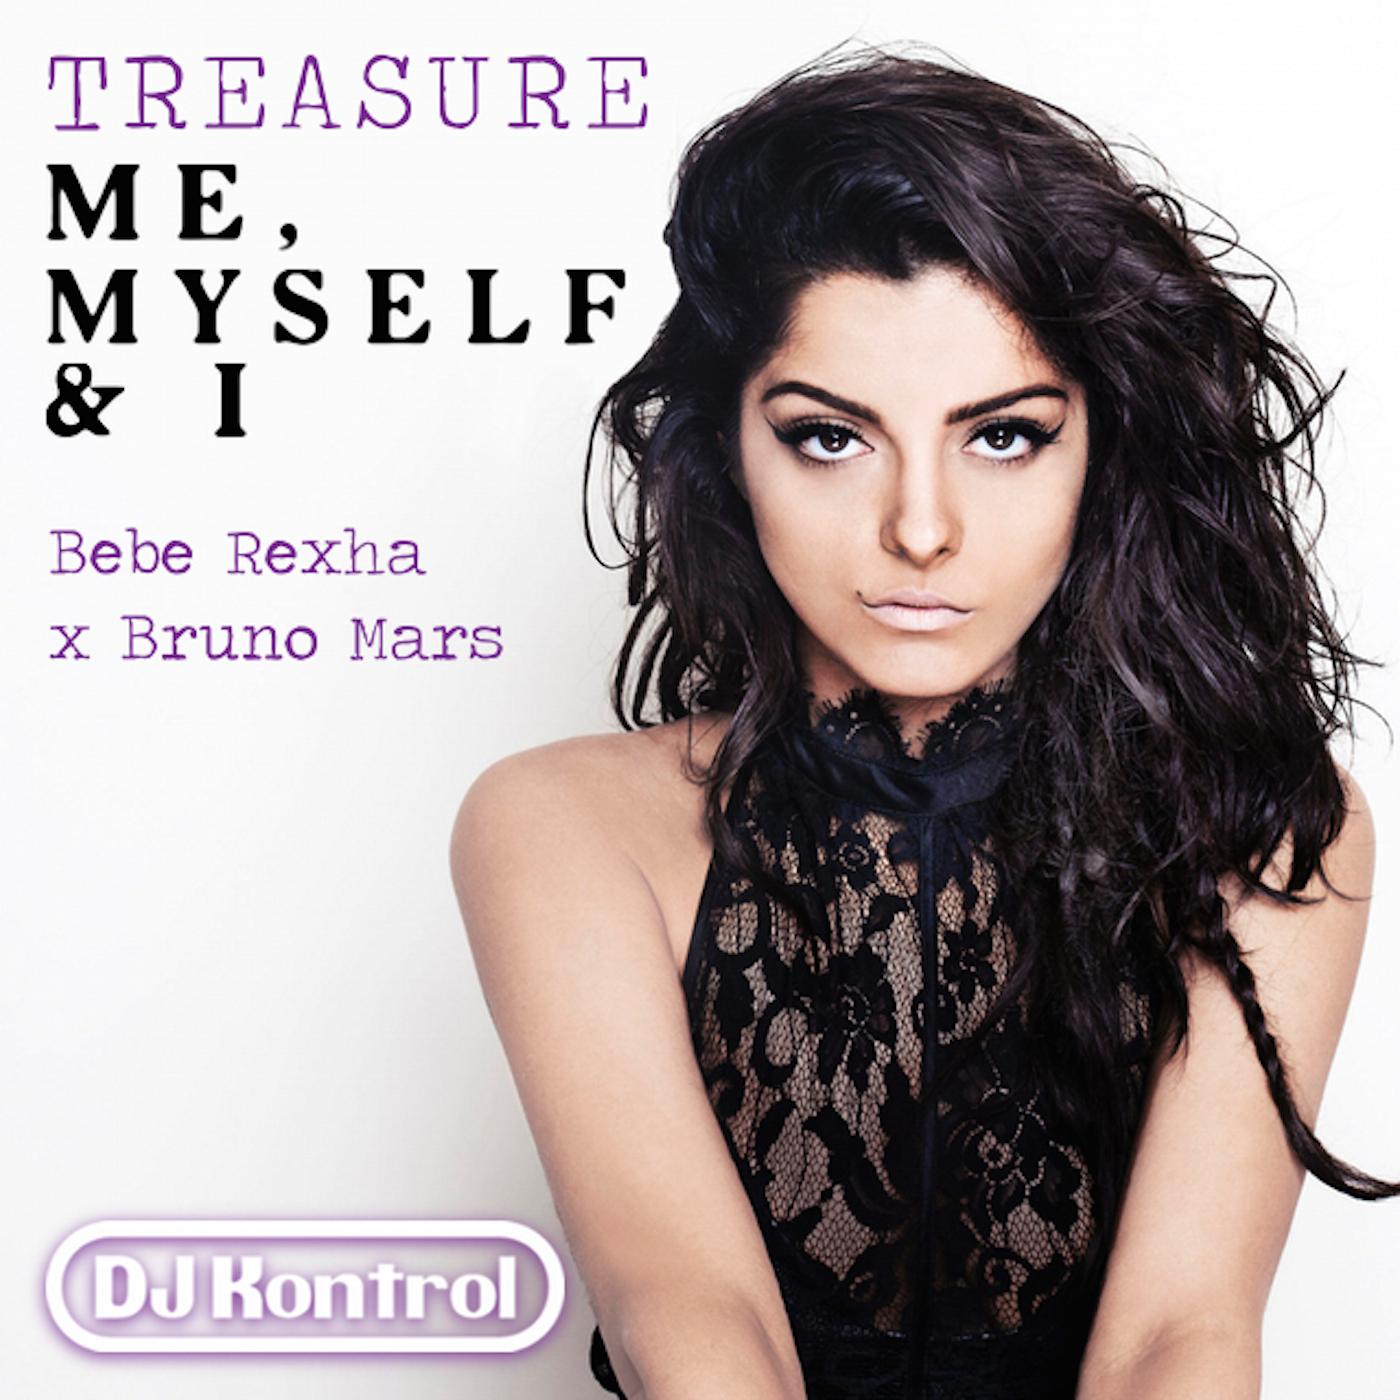 Bebe Rexha x Bruno Mars - Treasure Me, Myself & I (DJ Kontrol Mash)